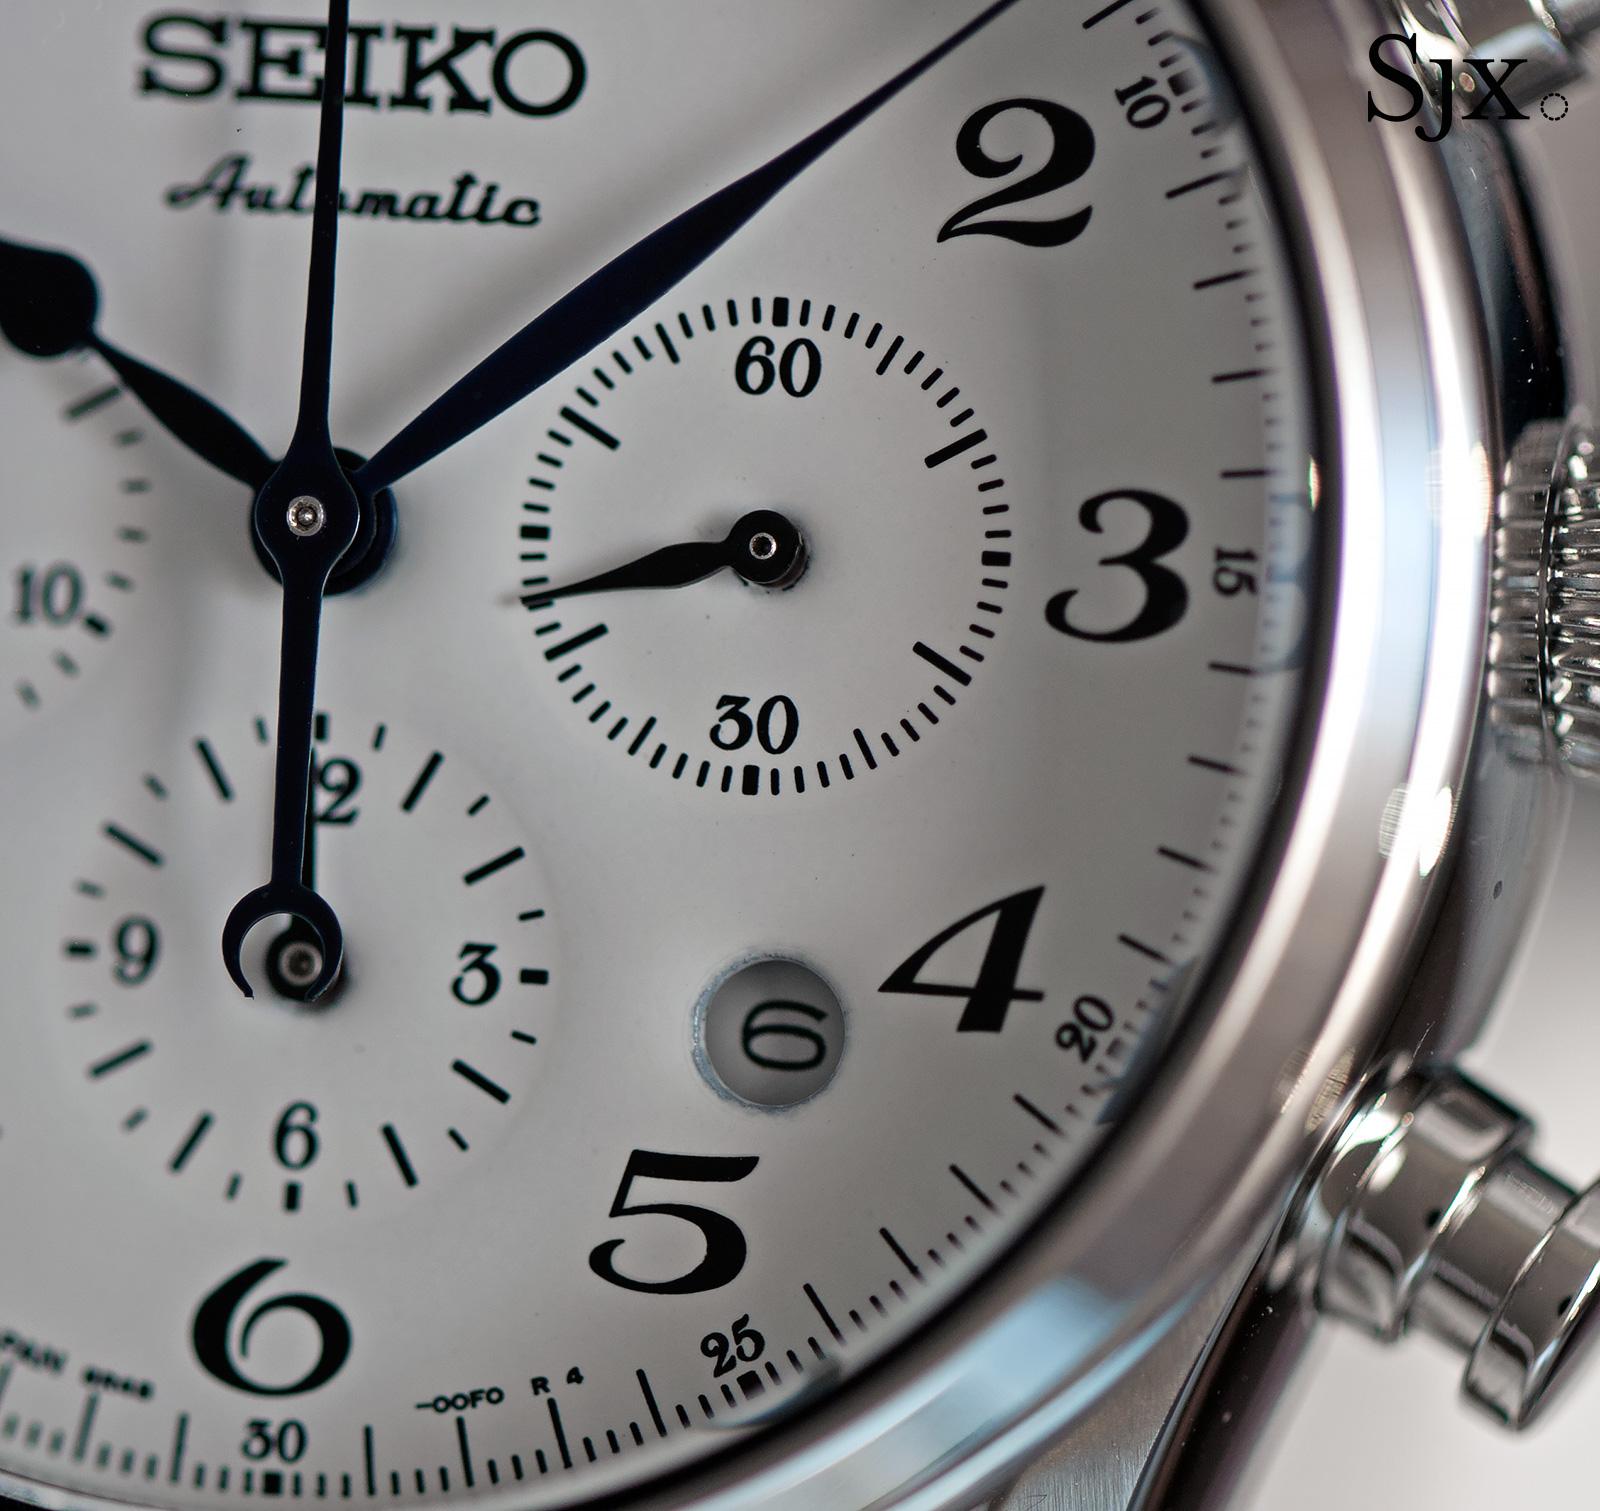 Seiko Presage 60th Anniversary Chronograph SRQ019 - 2